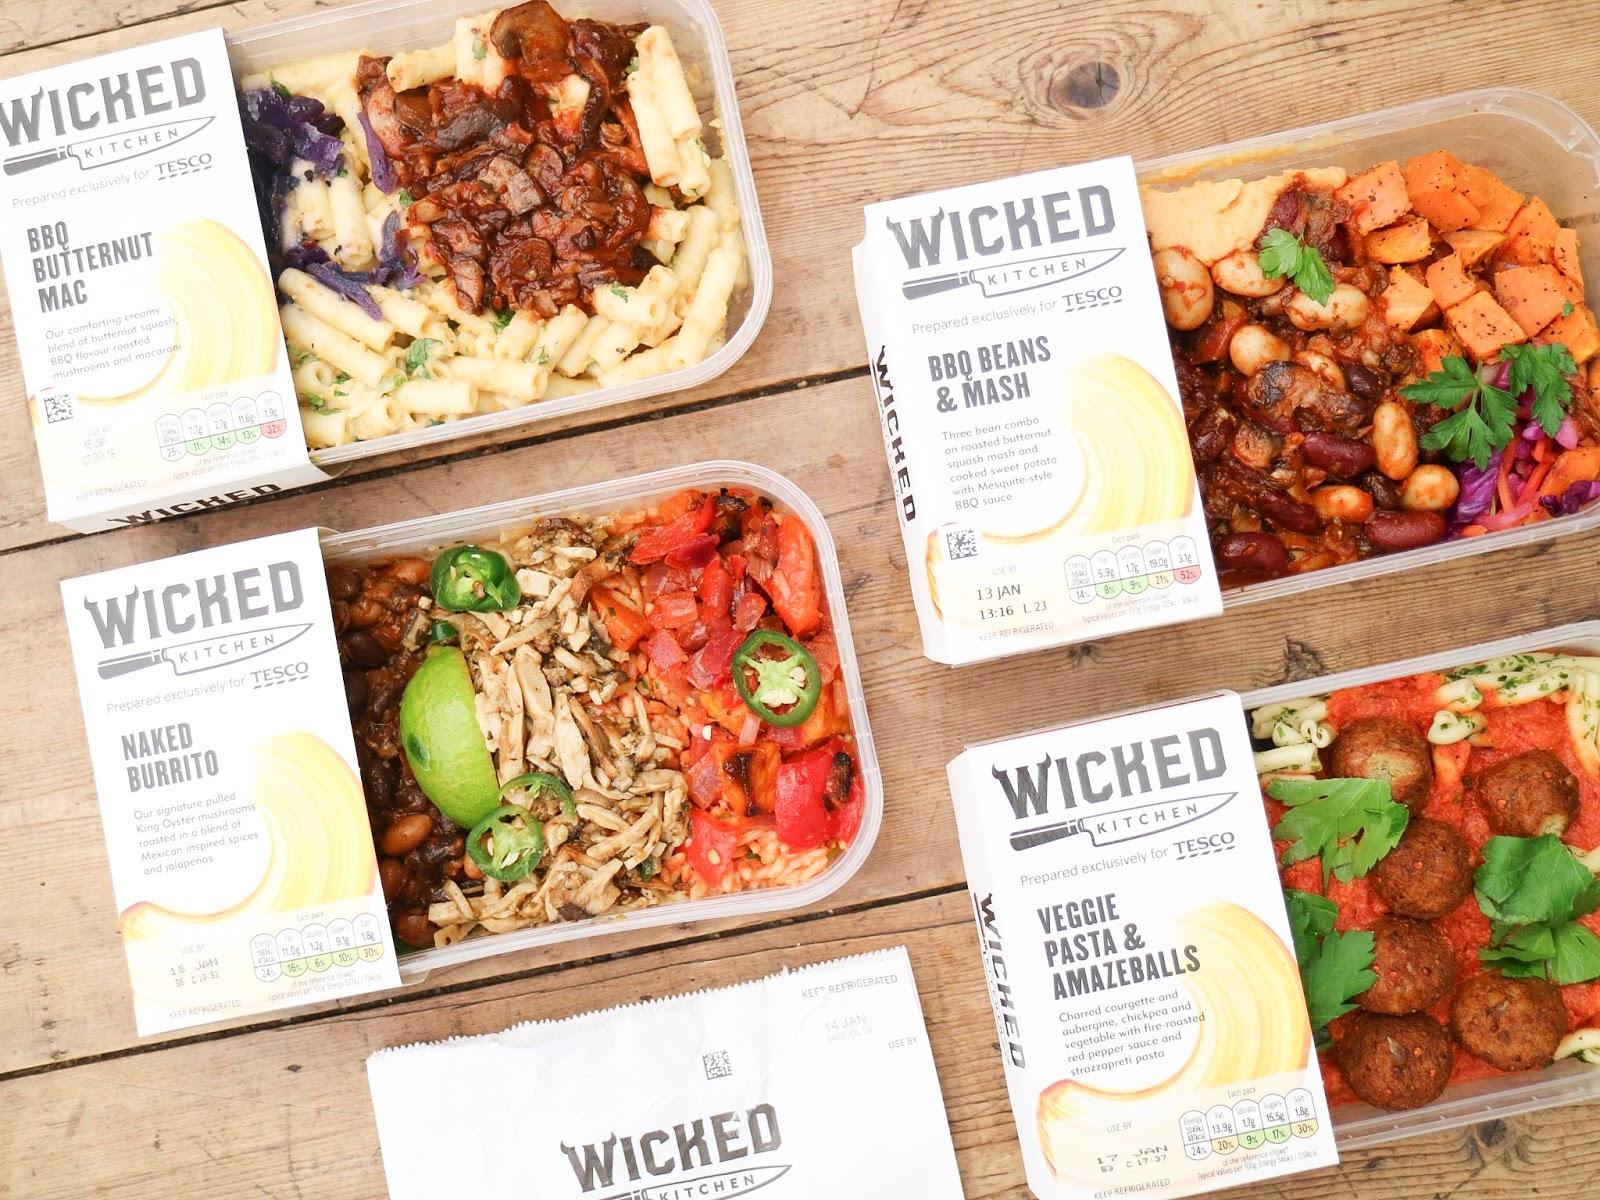 Wicked Kitchen Plant Based Food Range at Tesco